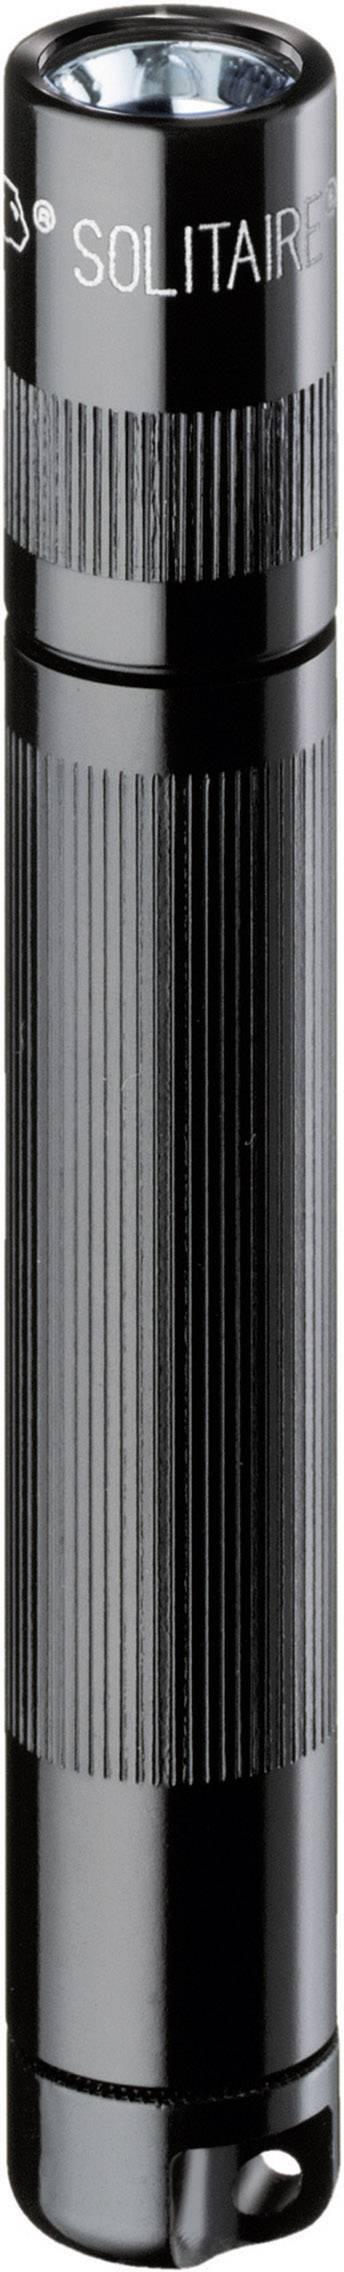 Svietidlo na kľúčenku Mag-Lite Solitaire LED, čierne